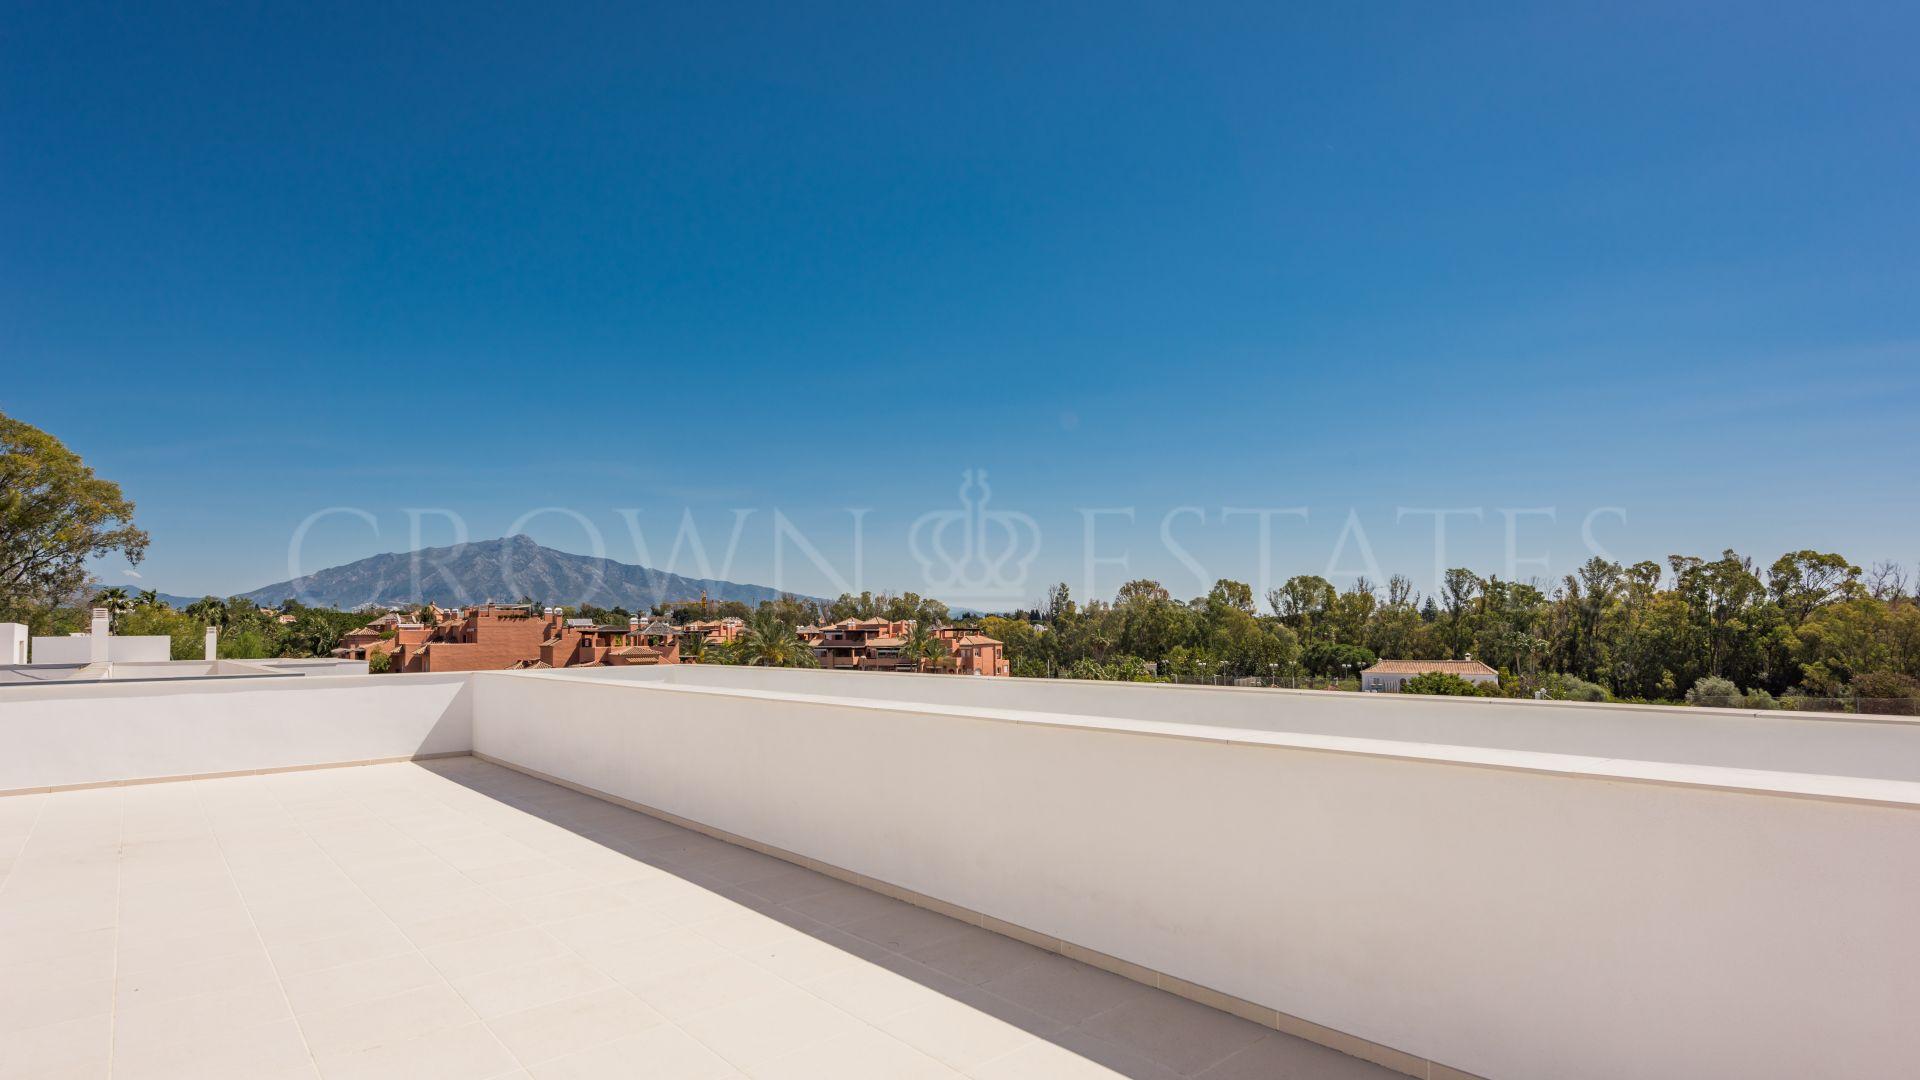 Loma de Casasola, 6 luxury villas very close to the sea and the golf course just by Guadalmina Baja area.